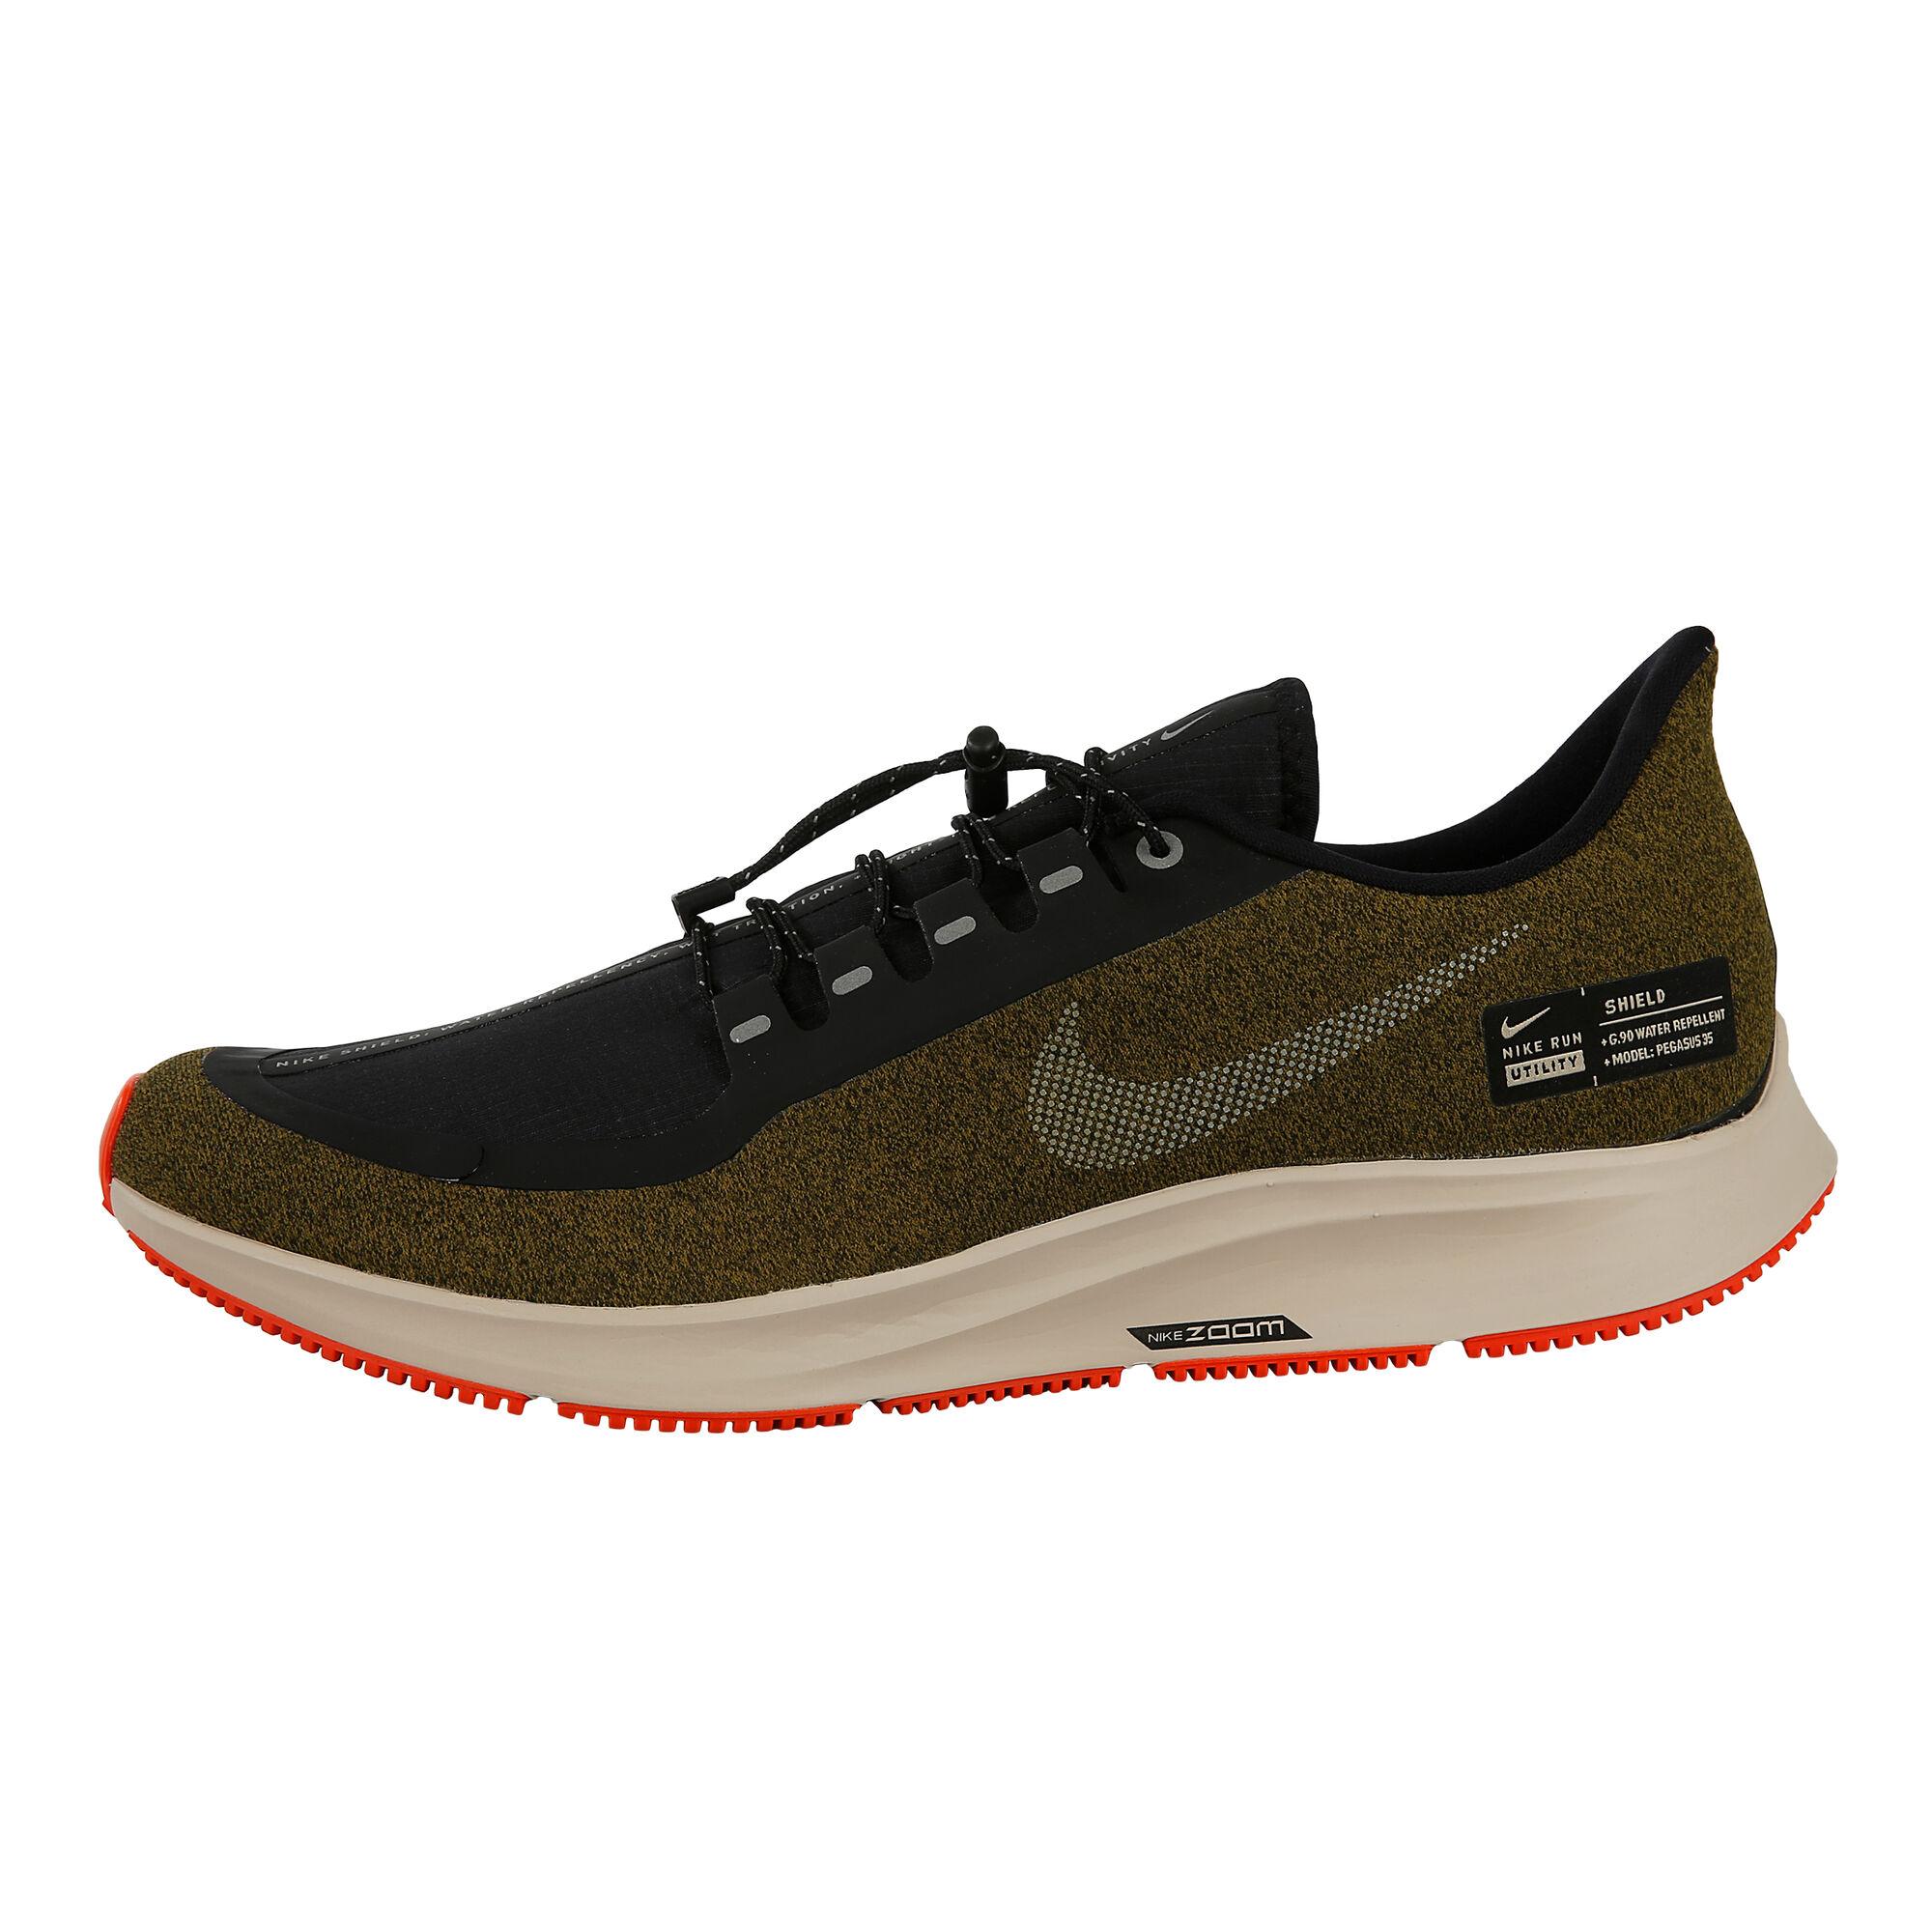 9816e3bdcc95 Nike · Nike · Nike · Nike · Nike · Nike · Nike · Nike · Nike · Nike. Air  Zoom Pegasus 35 Shield ...